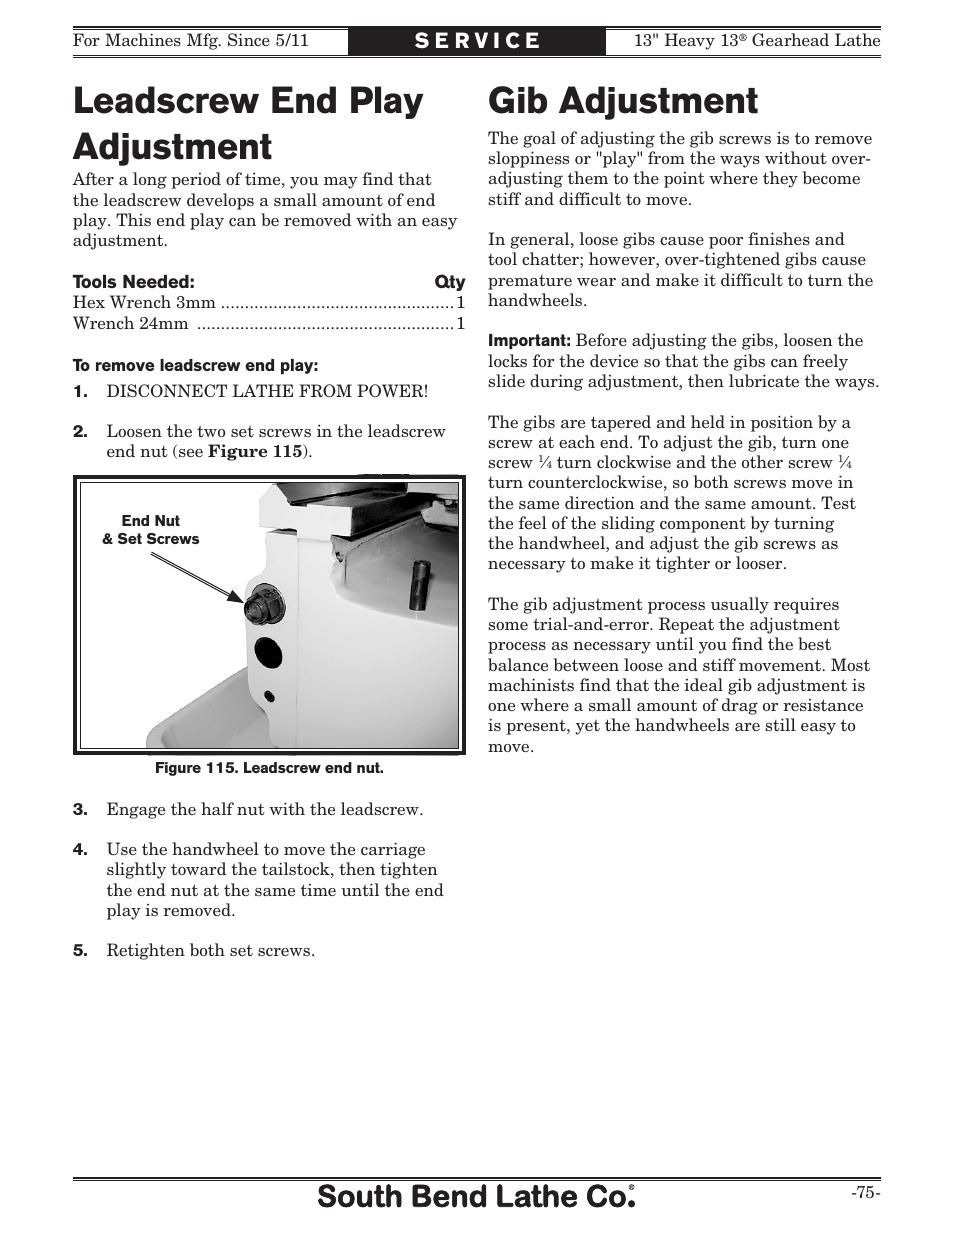 Gib adjustment, Leadscrew end play adjustment | Southbend 13